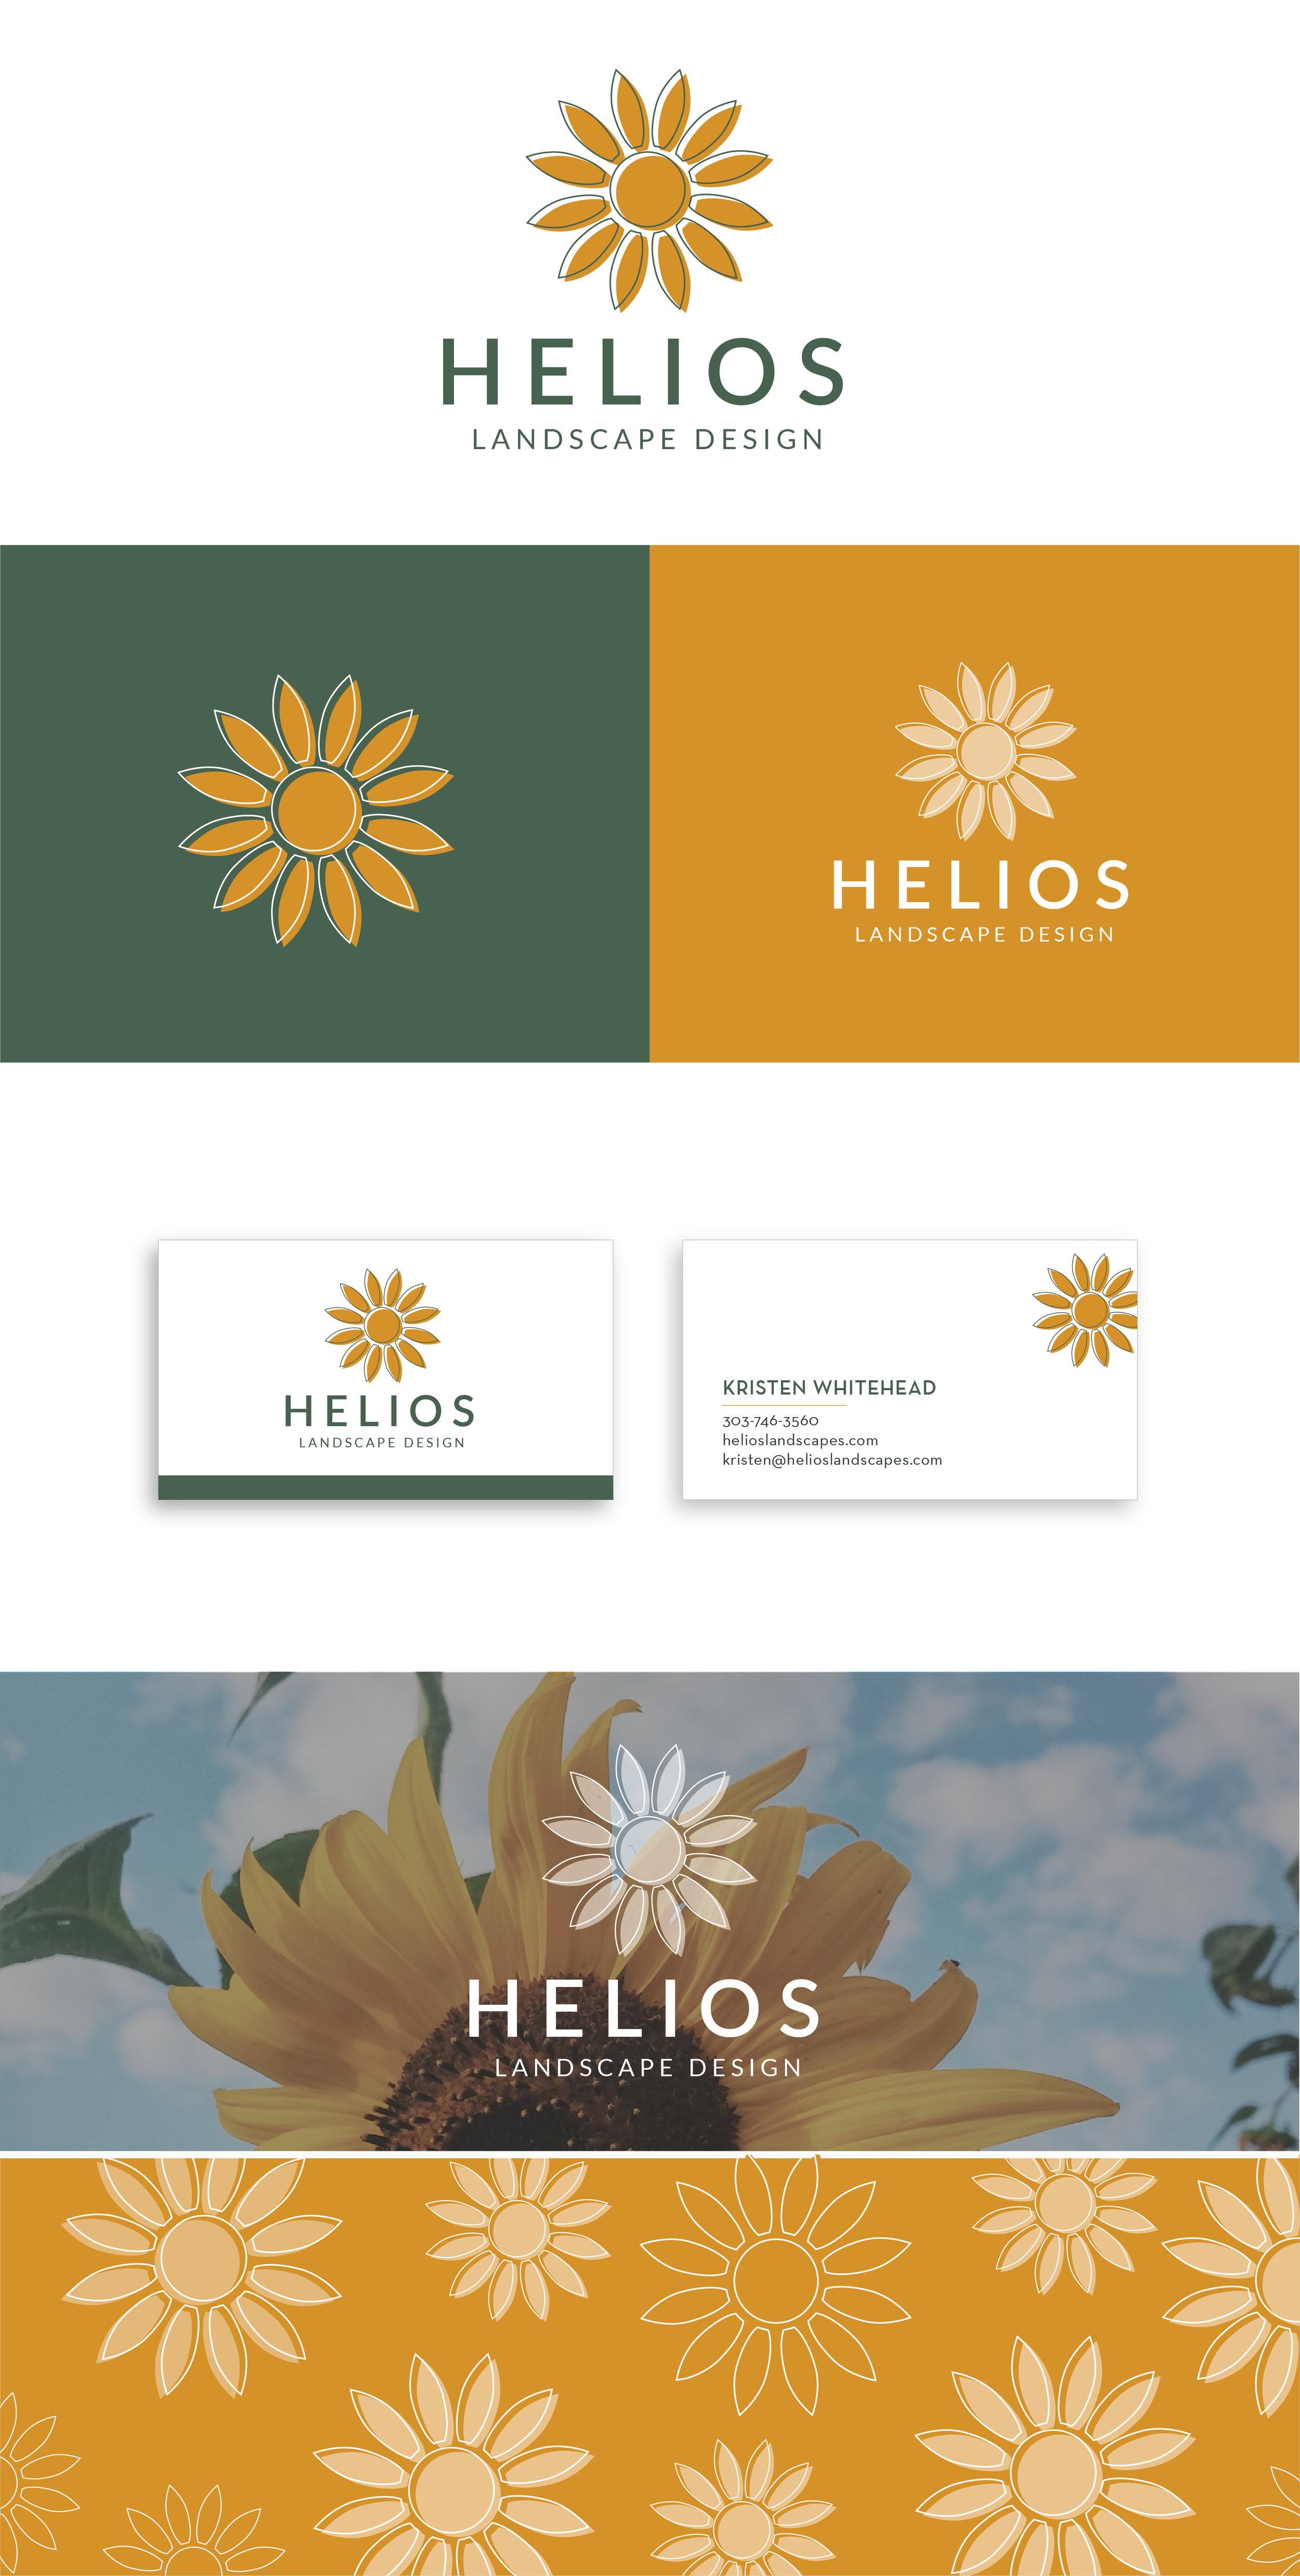 HeliosLandscapeDesign_LogoTrials-04.jpg